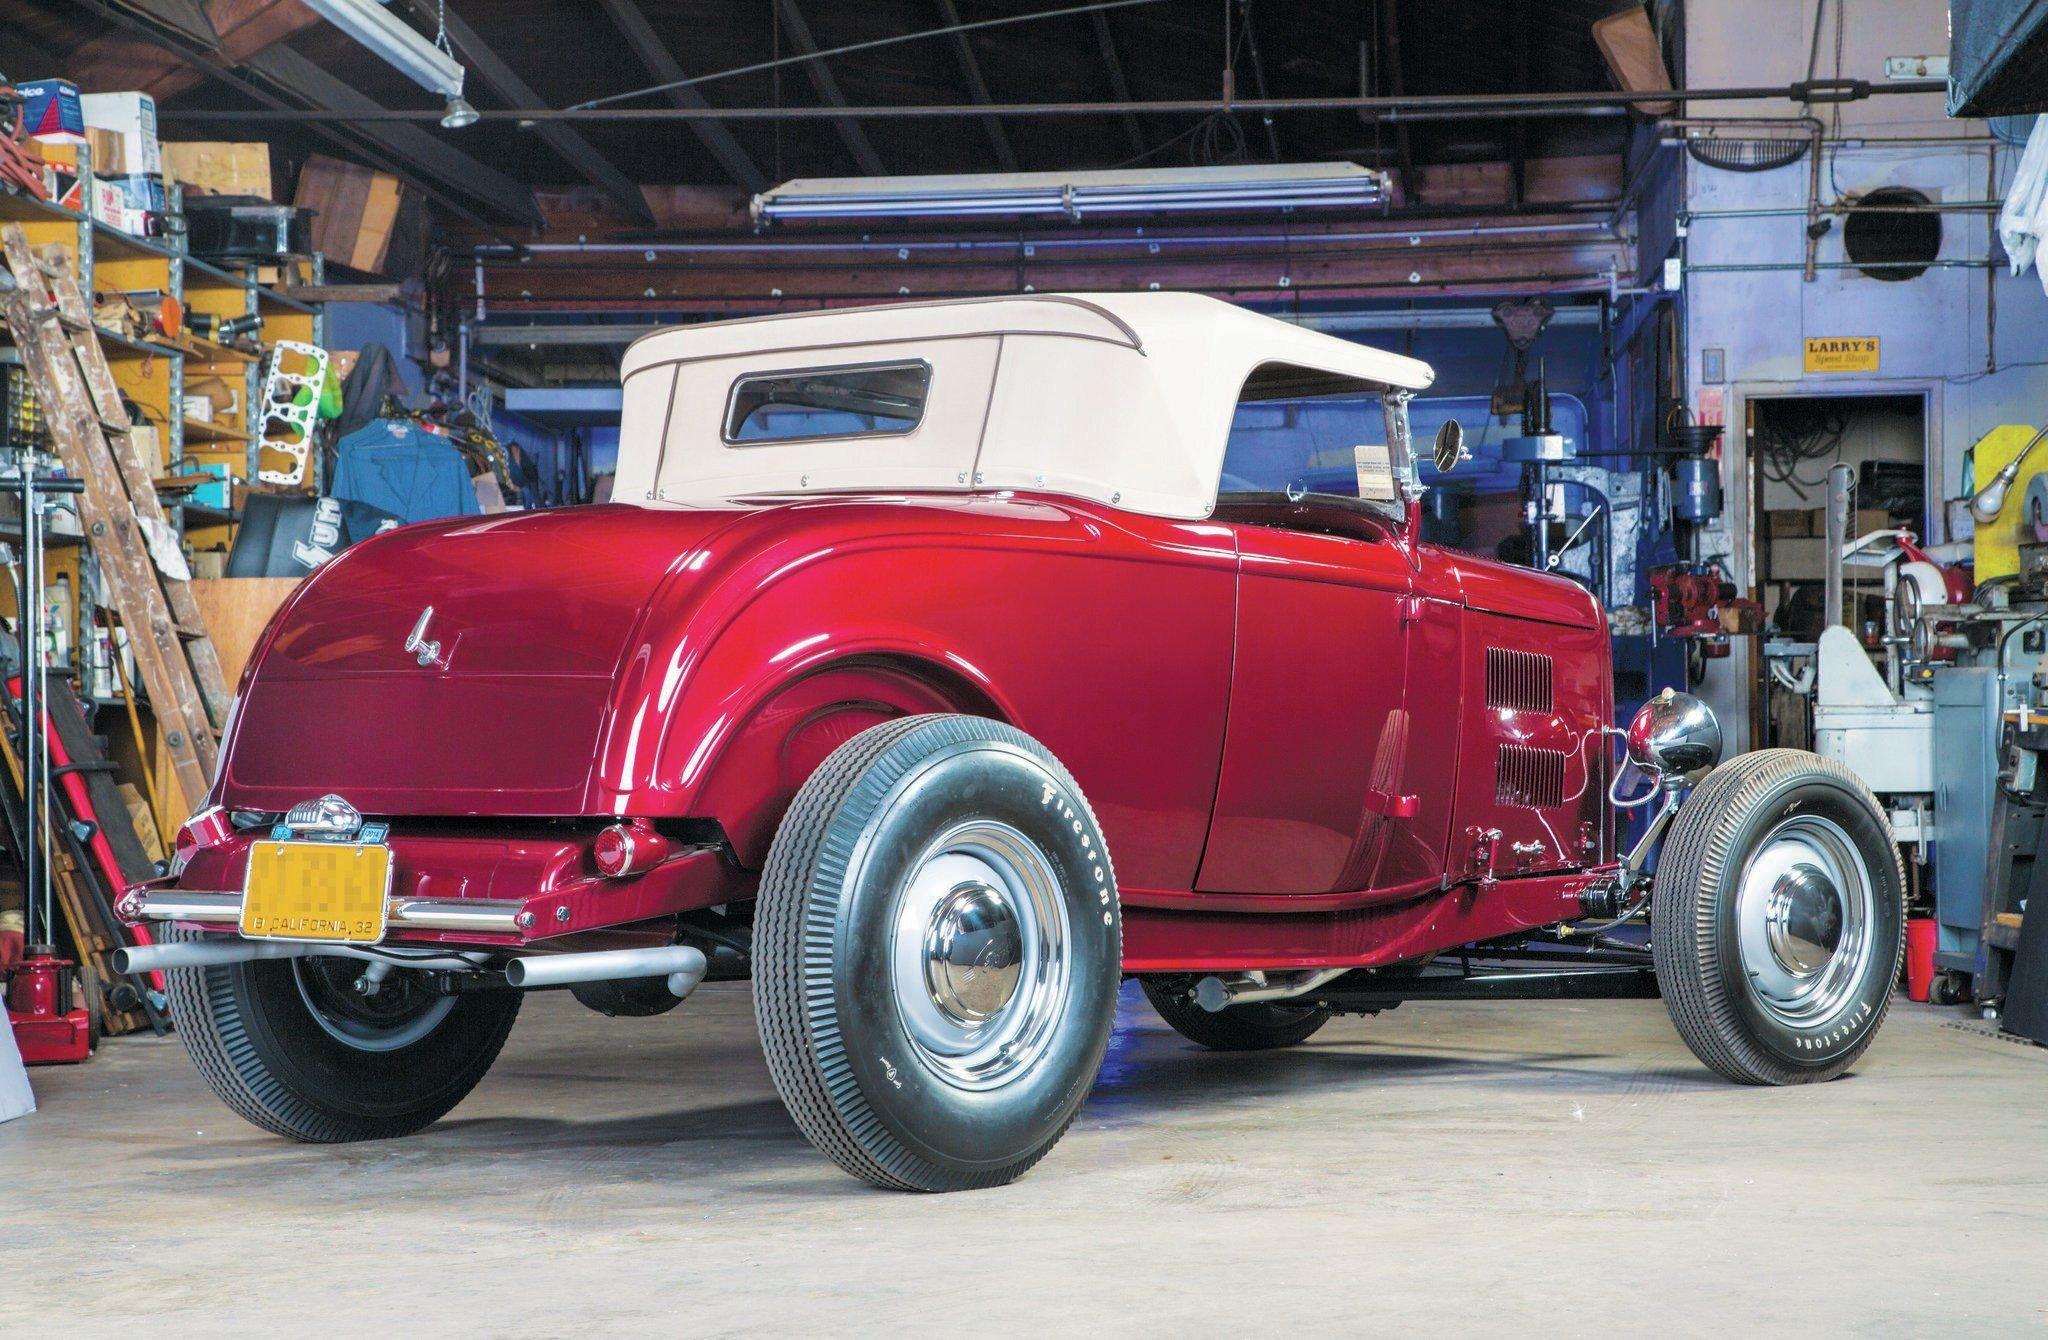 1932 Ford Roadster-05 wallpaper